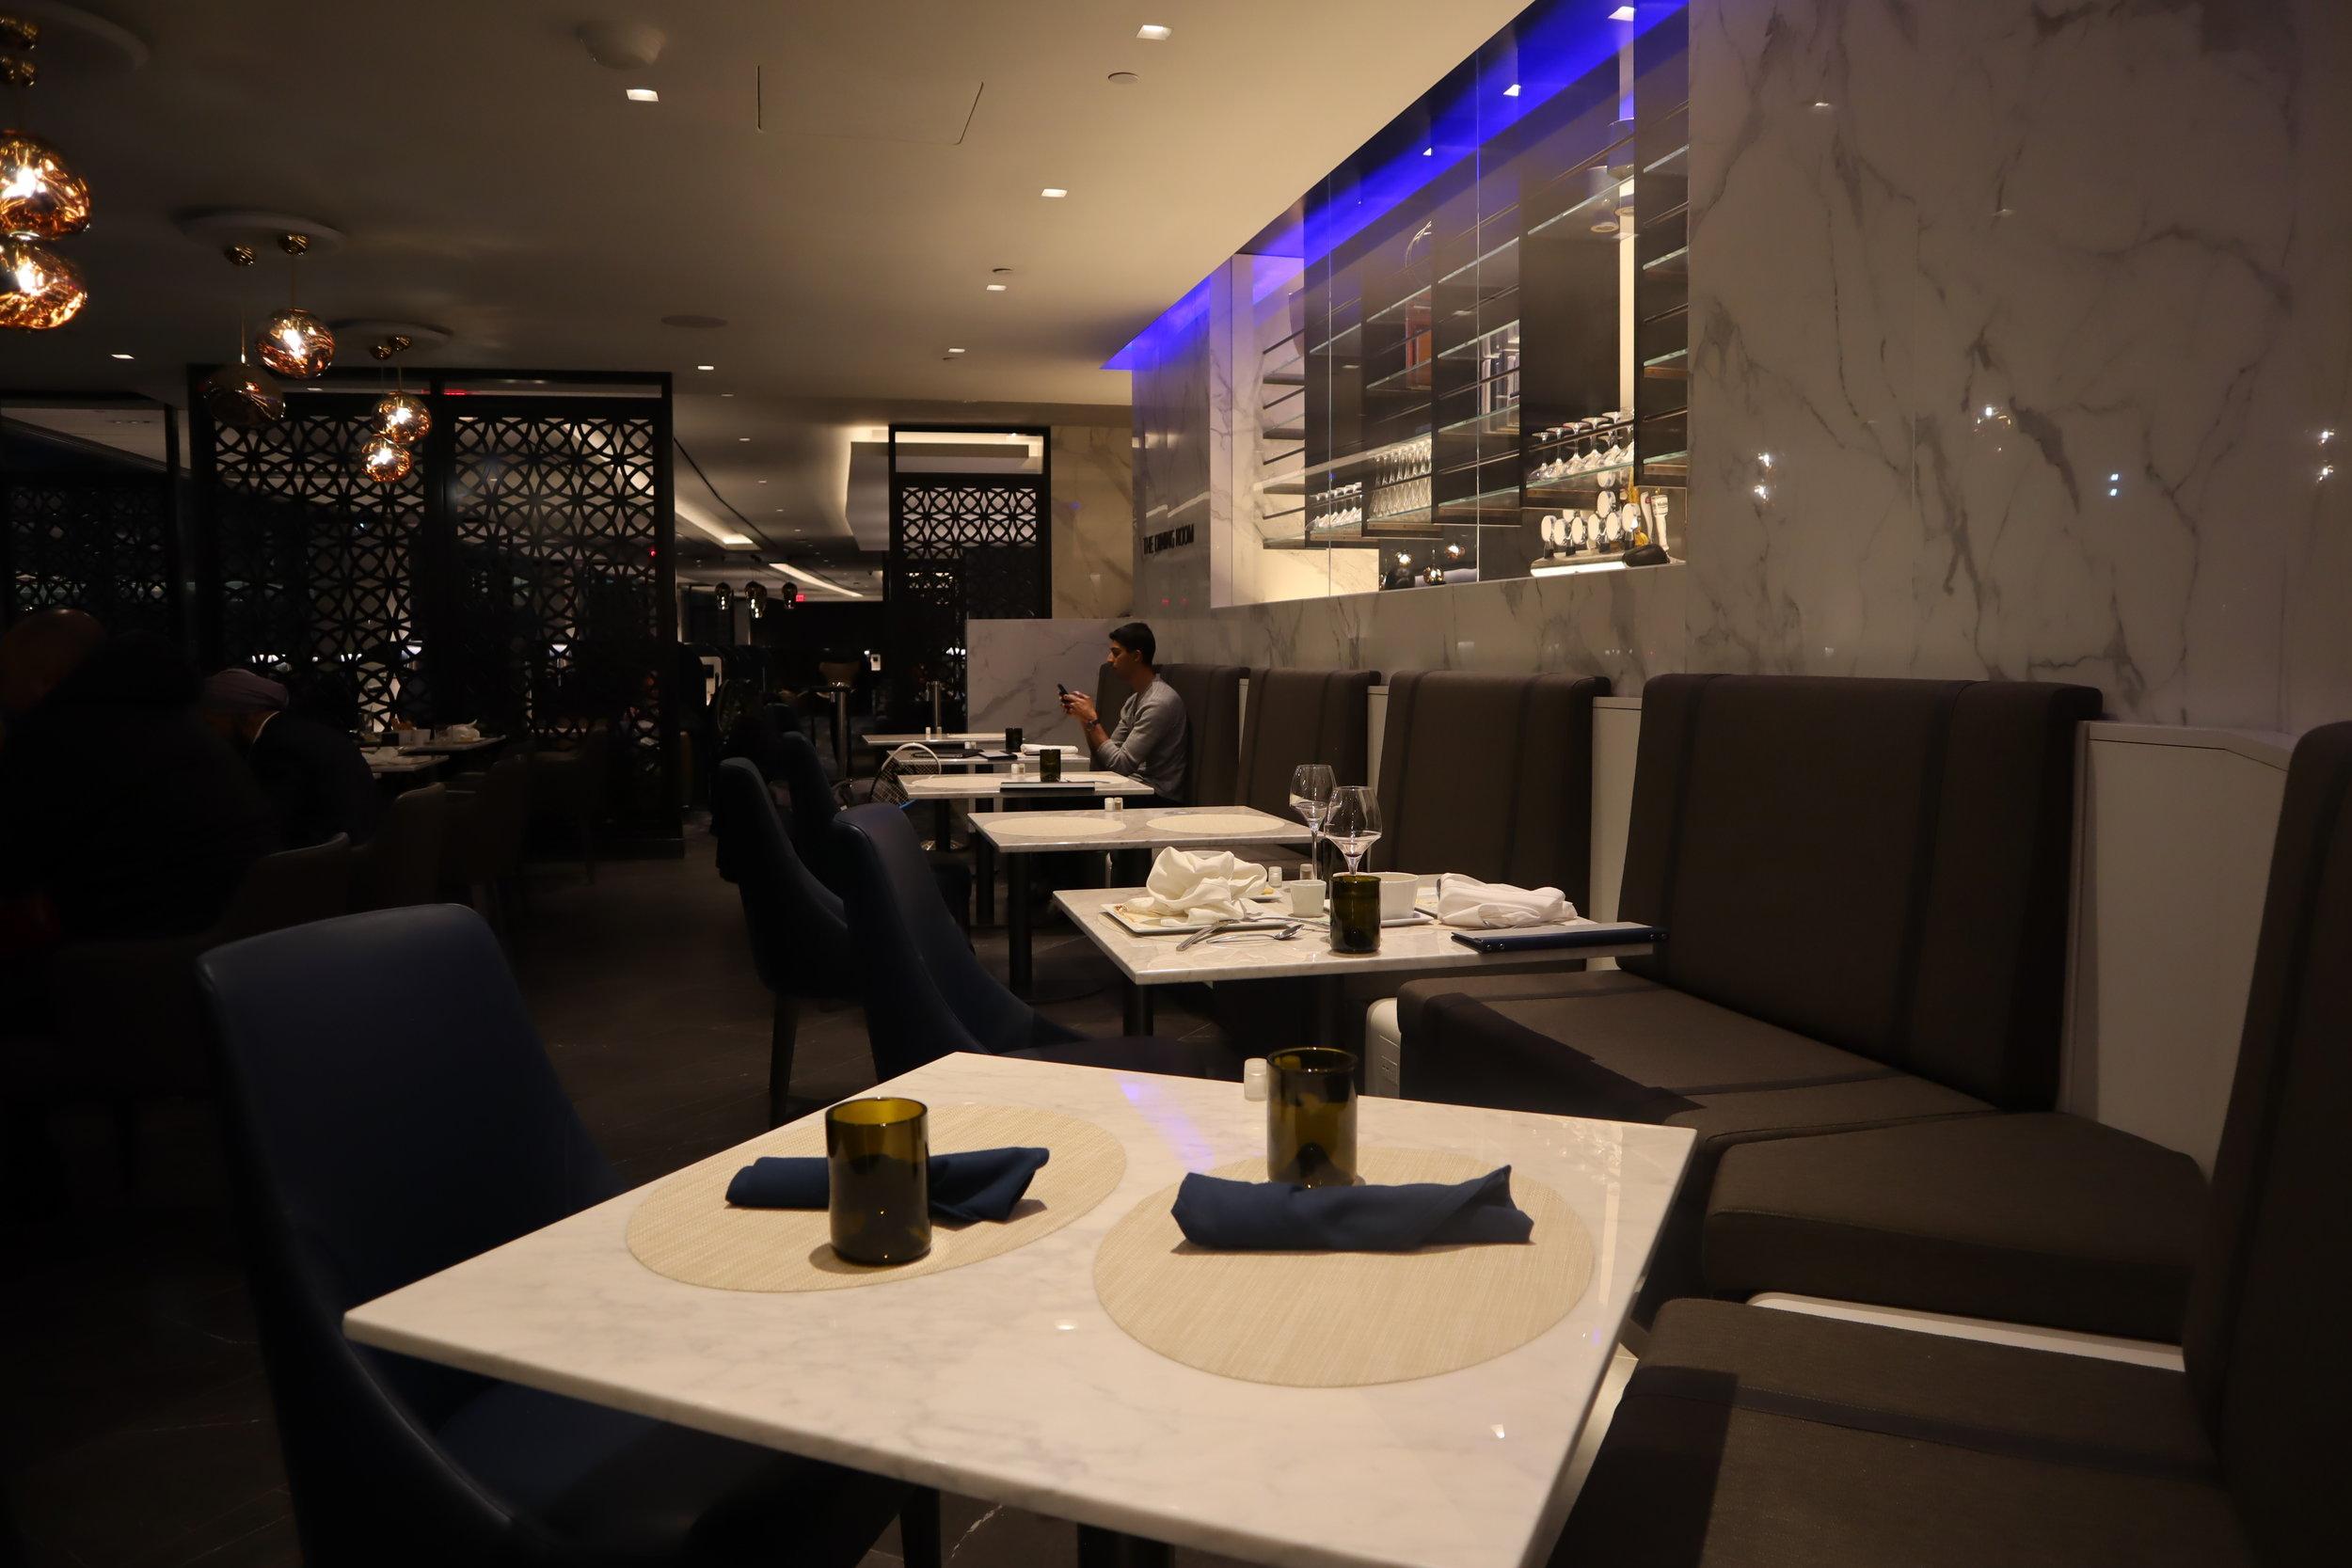 United Polaris Lounge Newark – Sit-down dinner